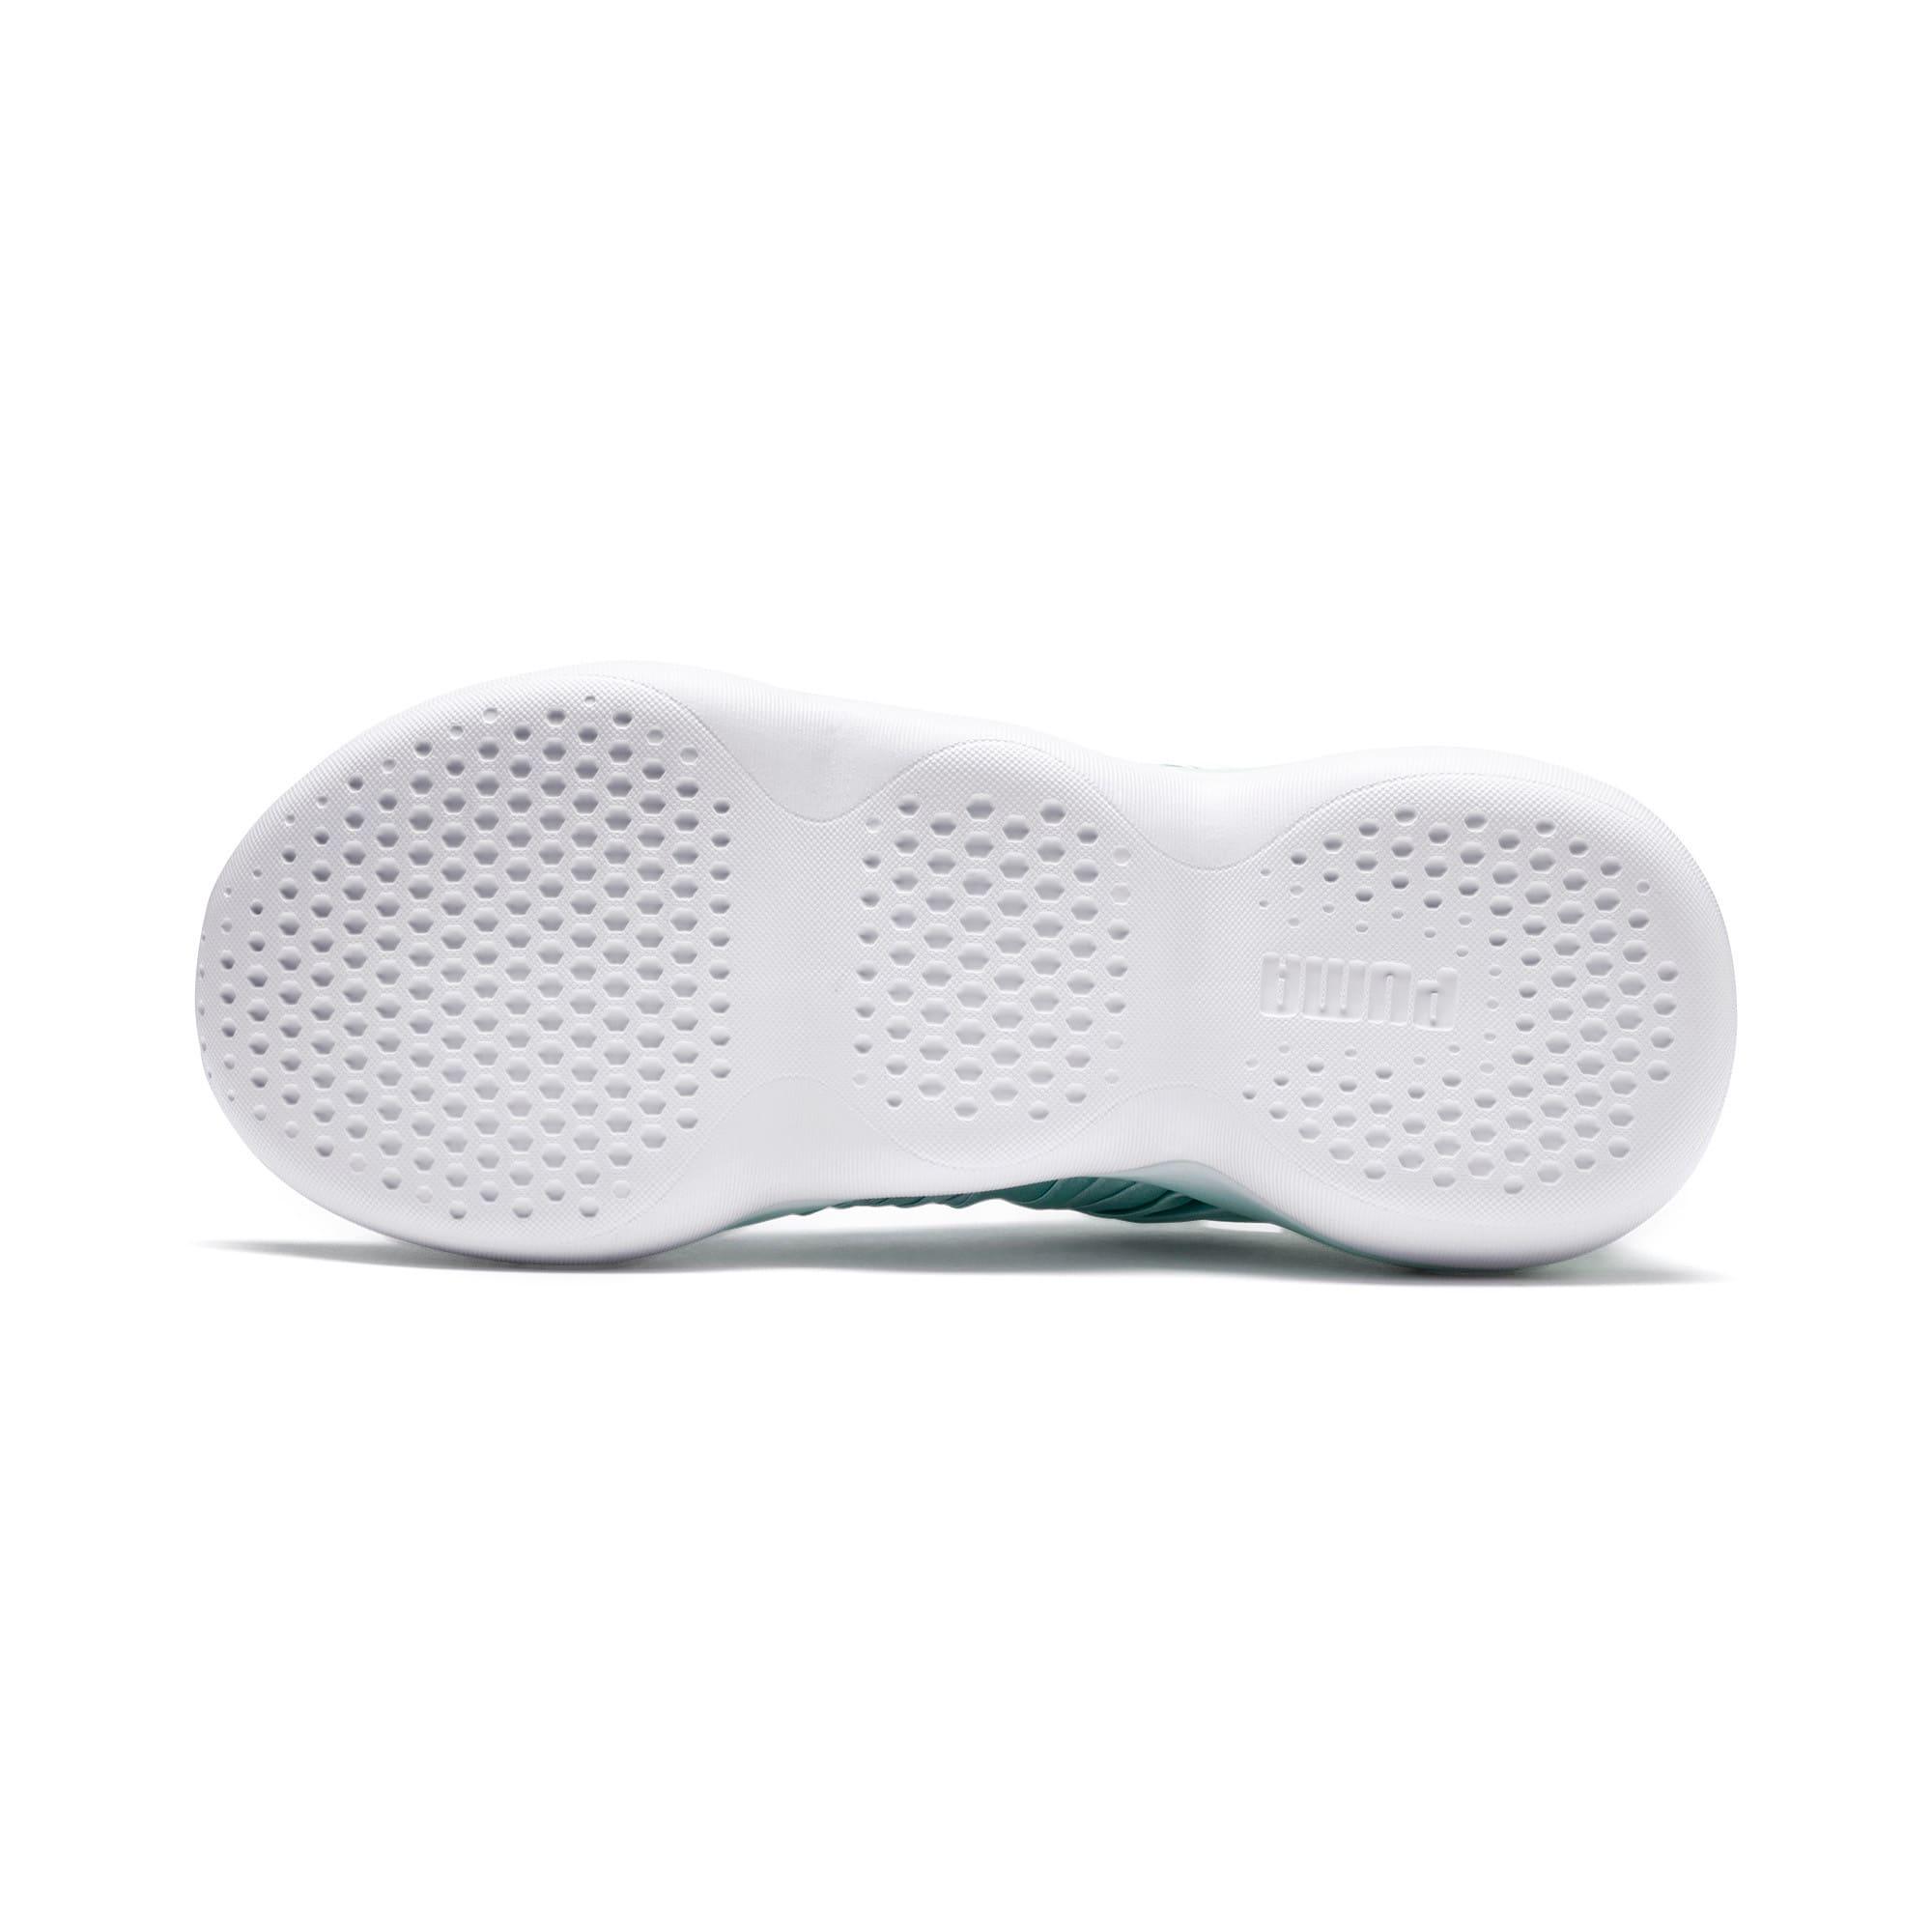 Thumbnail 3 of Flourish Cosmic Women's Training Shoes, Fair Aqua-Puma White, medium